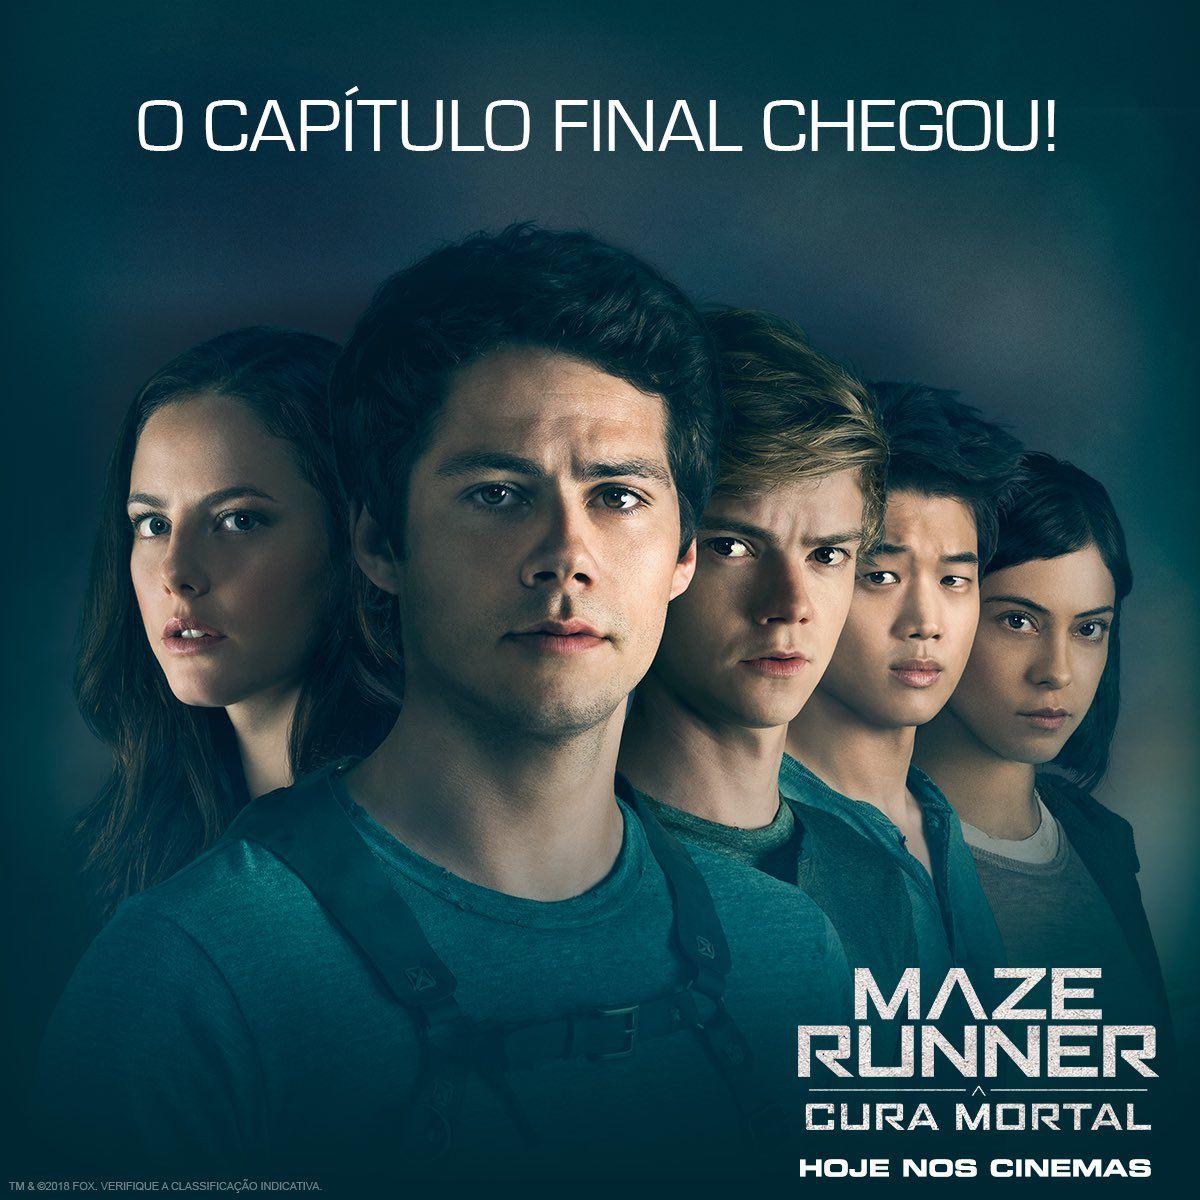 Hashtag ACuraMortal no Twitter   Maze runner, Maze, Dylan o'brien